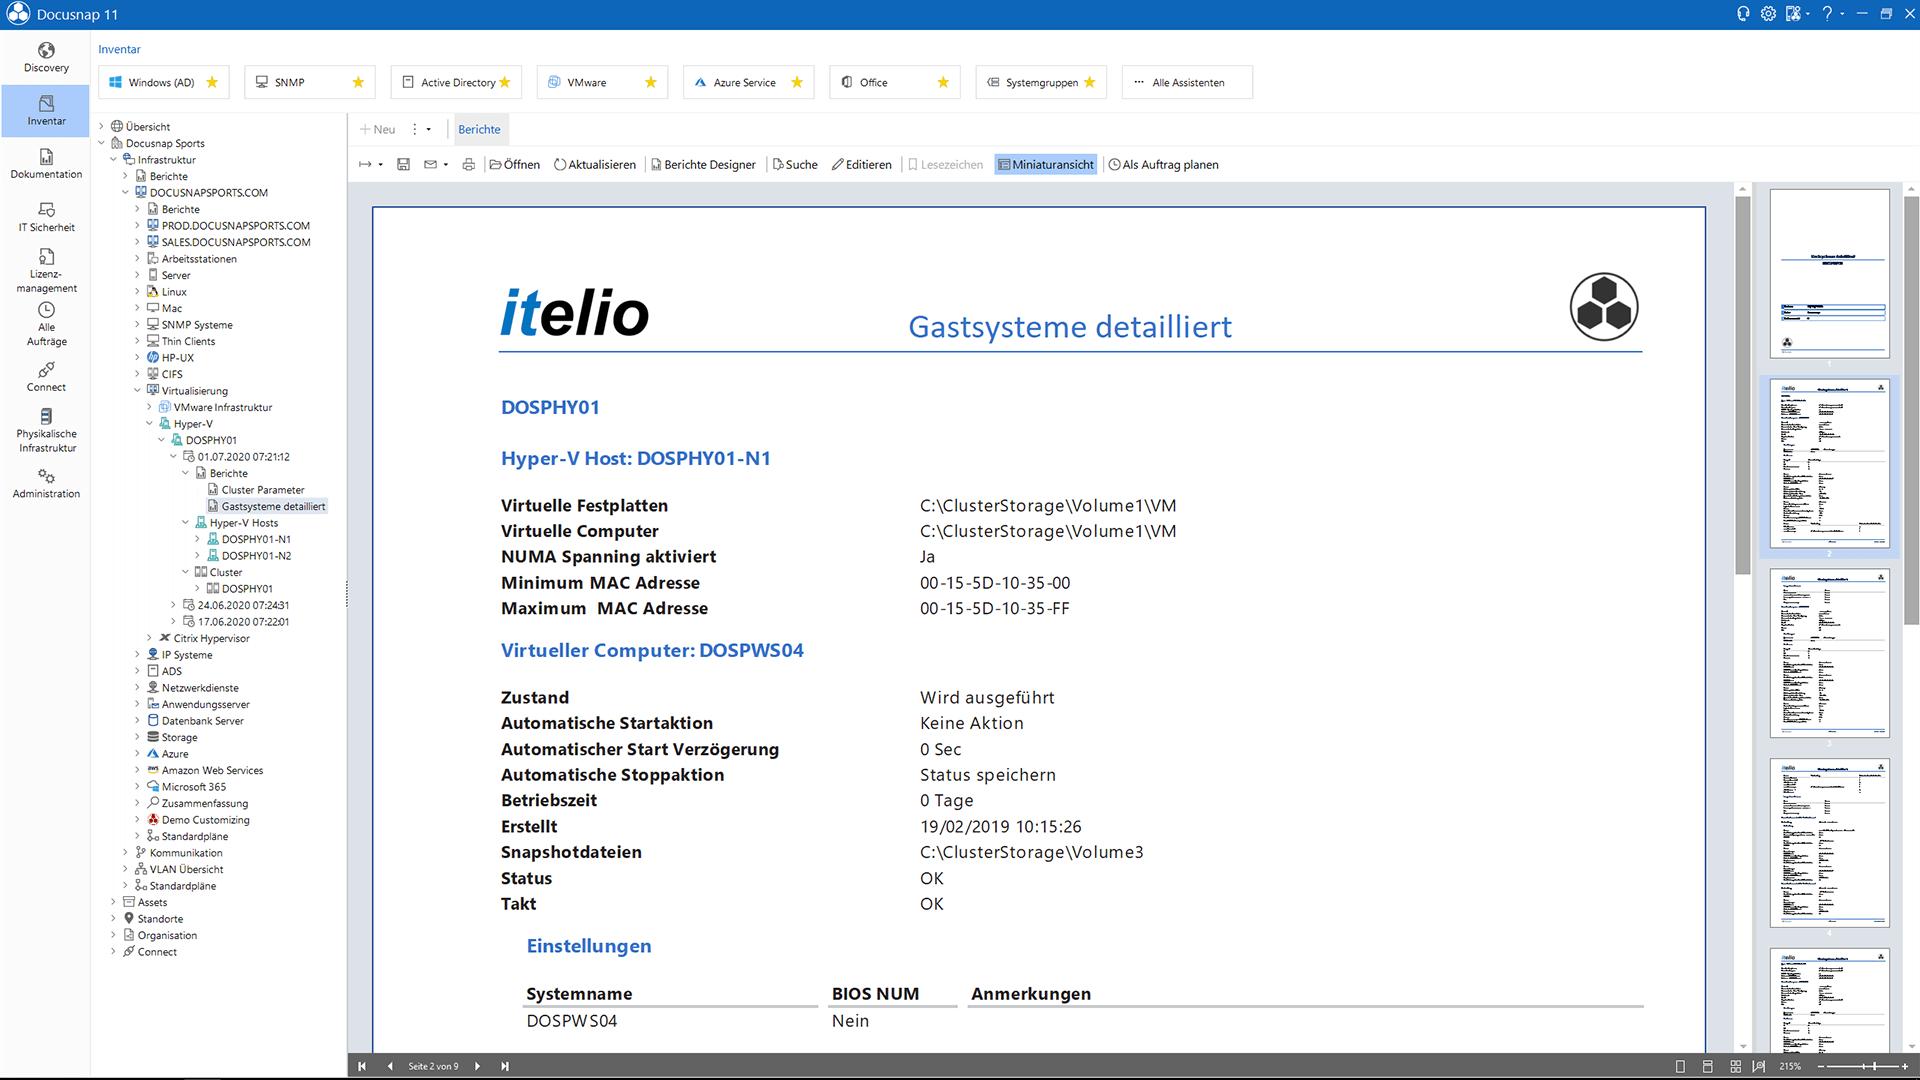 Screenshot: Erstellung VMware XenCenter und Hyper-V Bericht